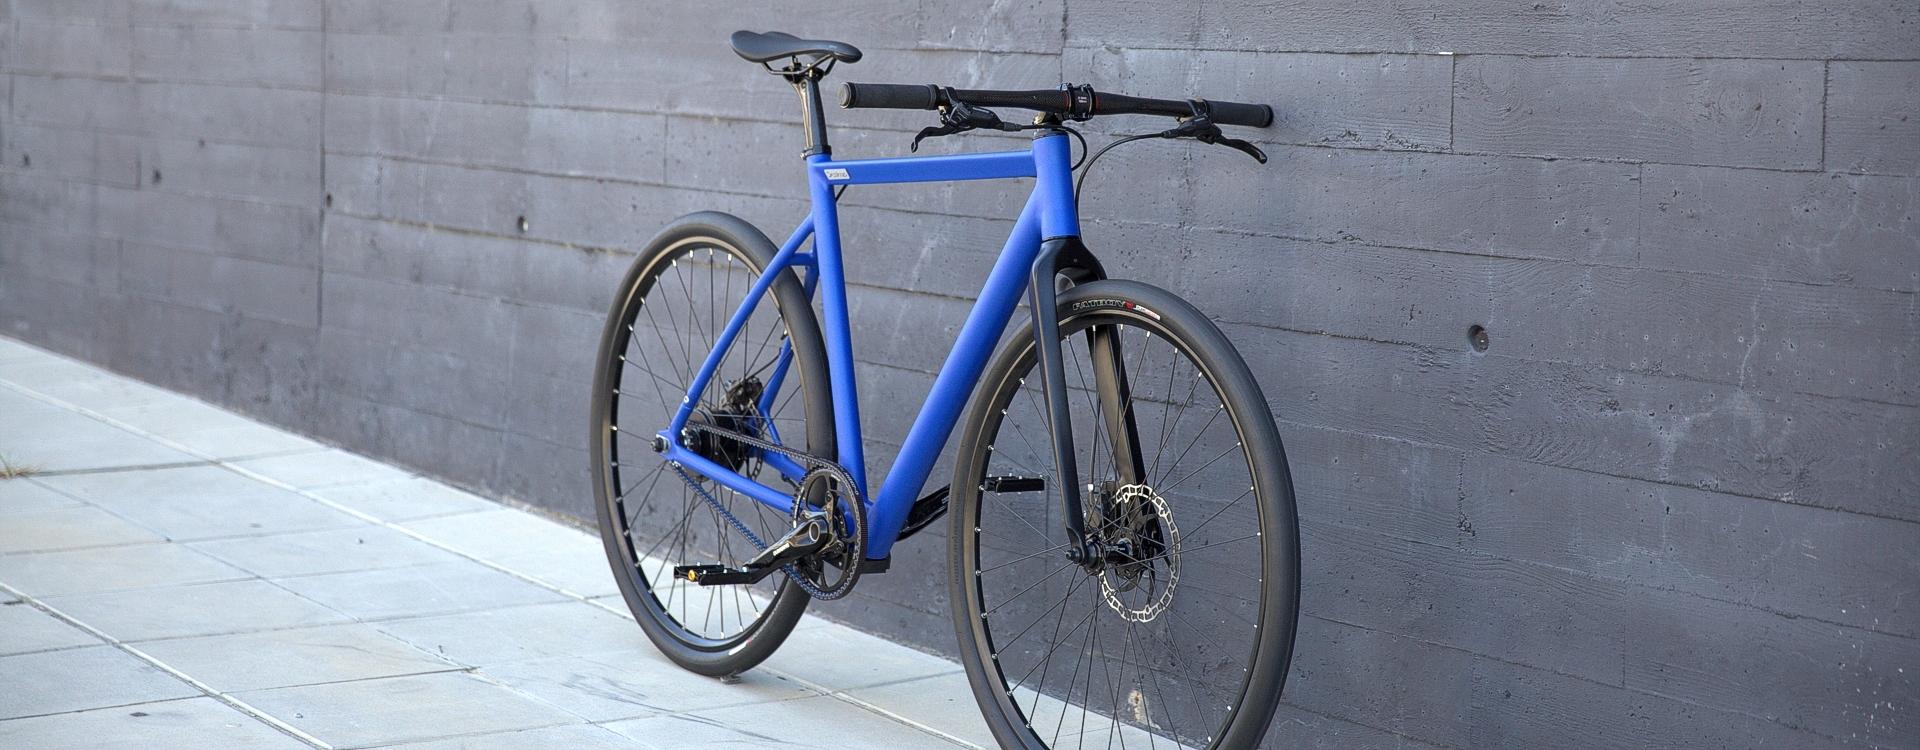 Desiknia- blue